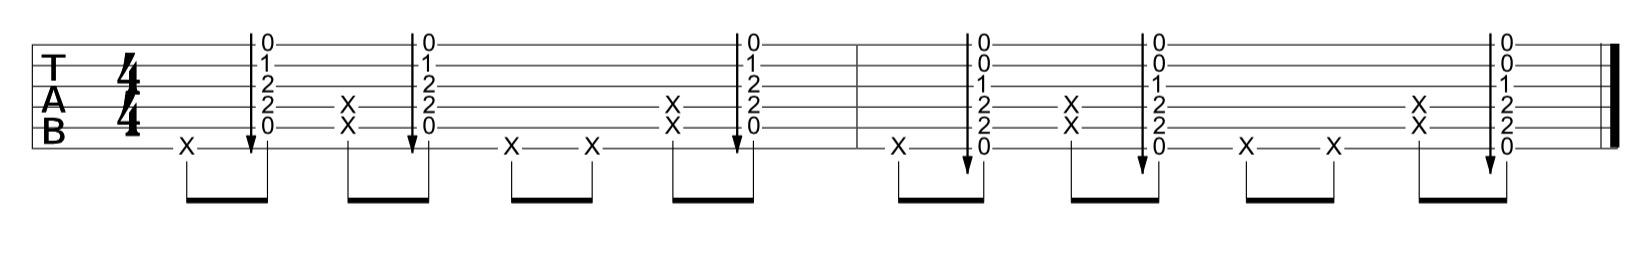 Chord-Percussion-1c